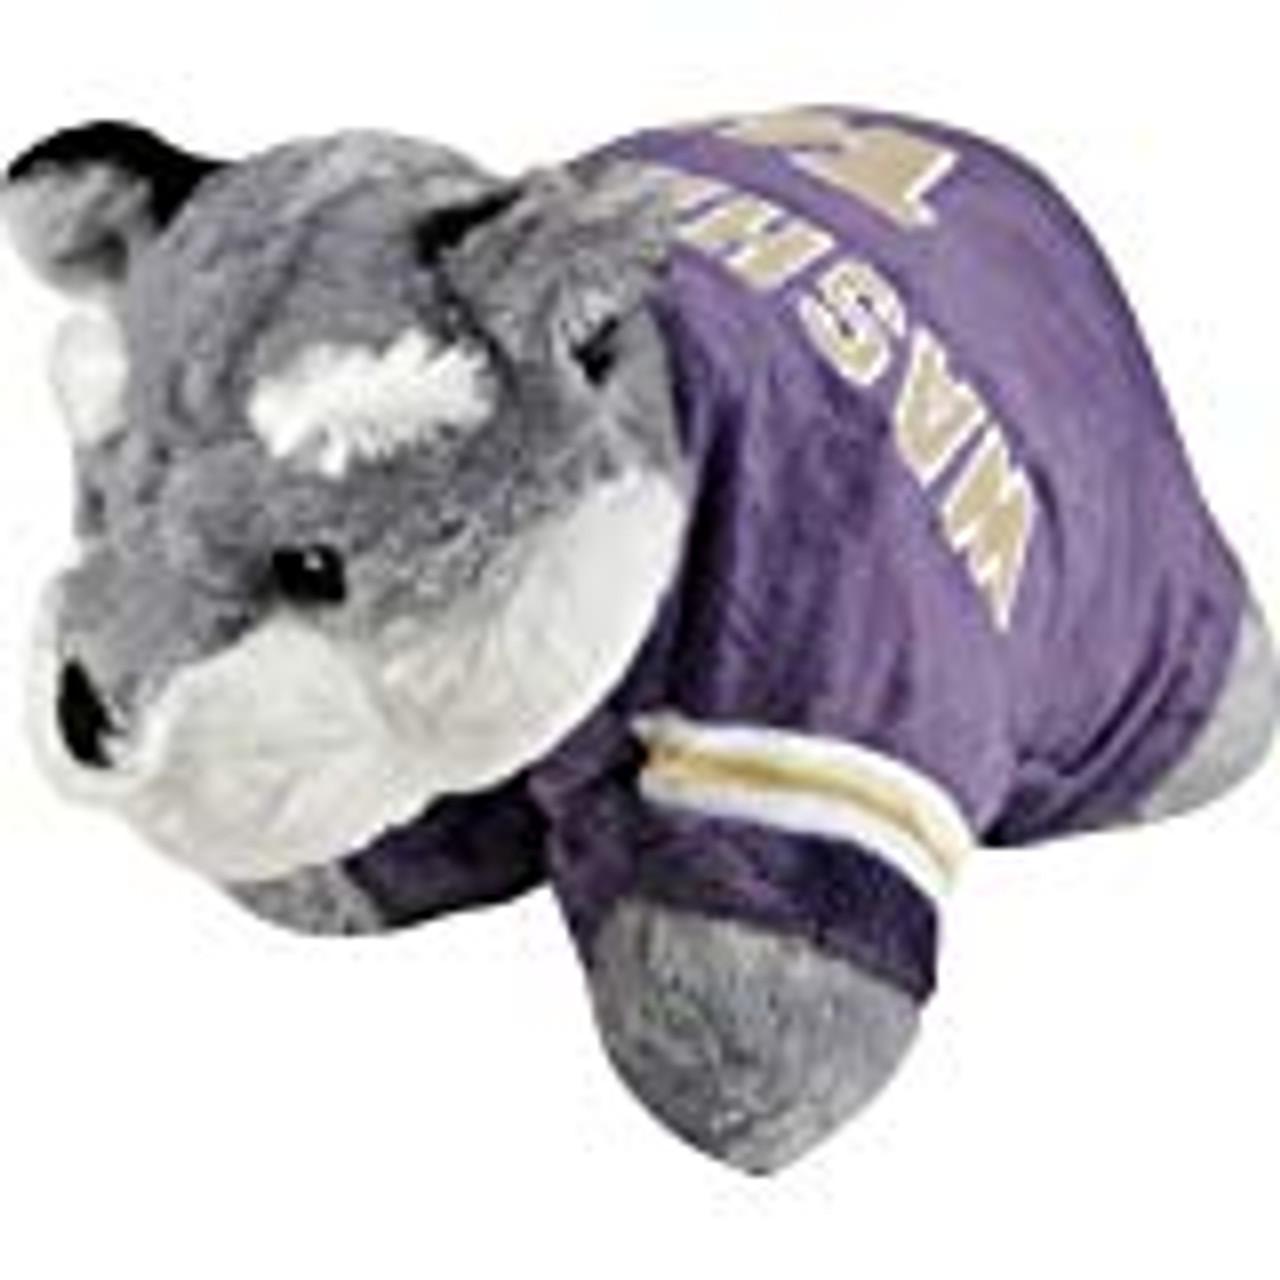 university of washington pillow pet